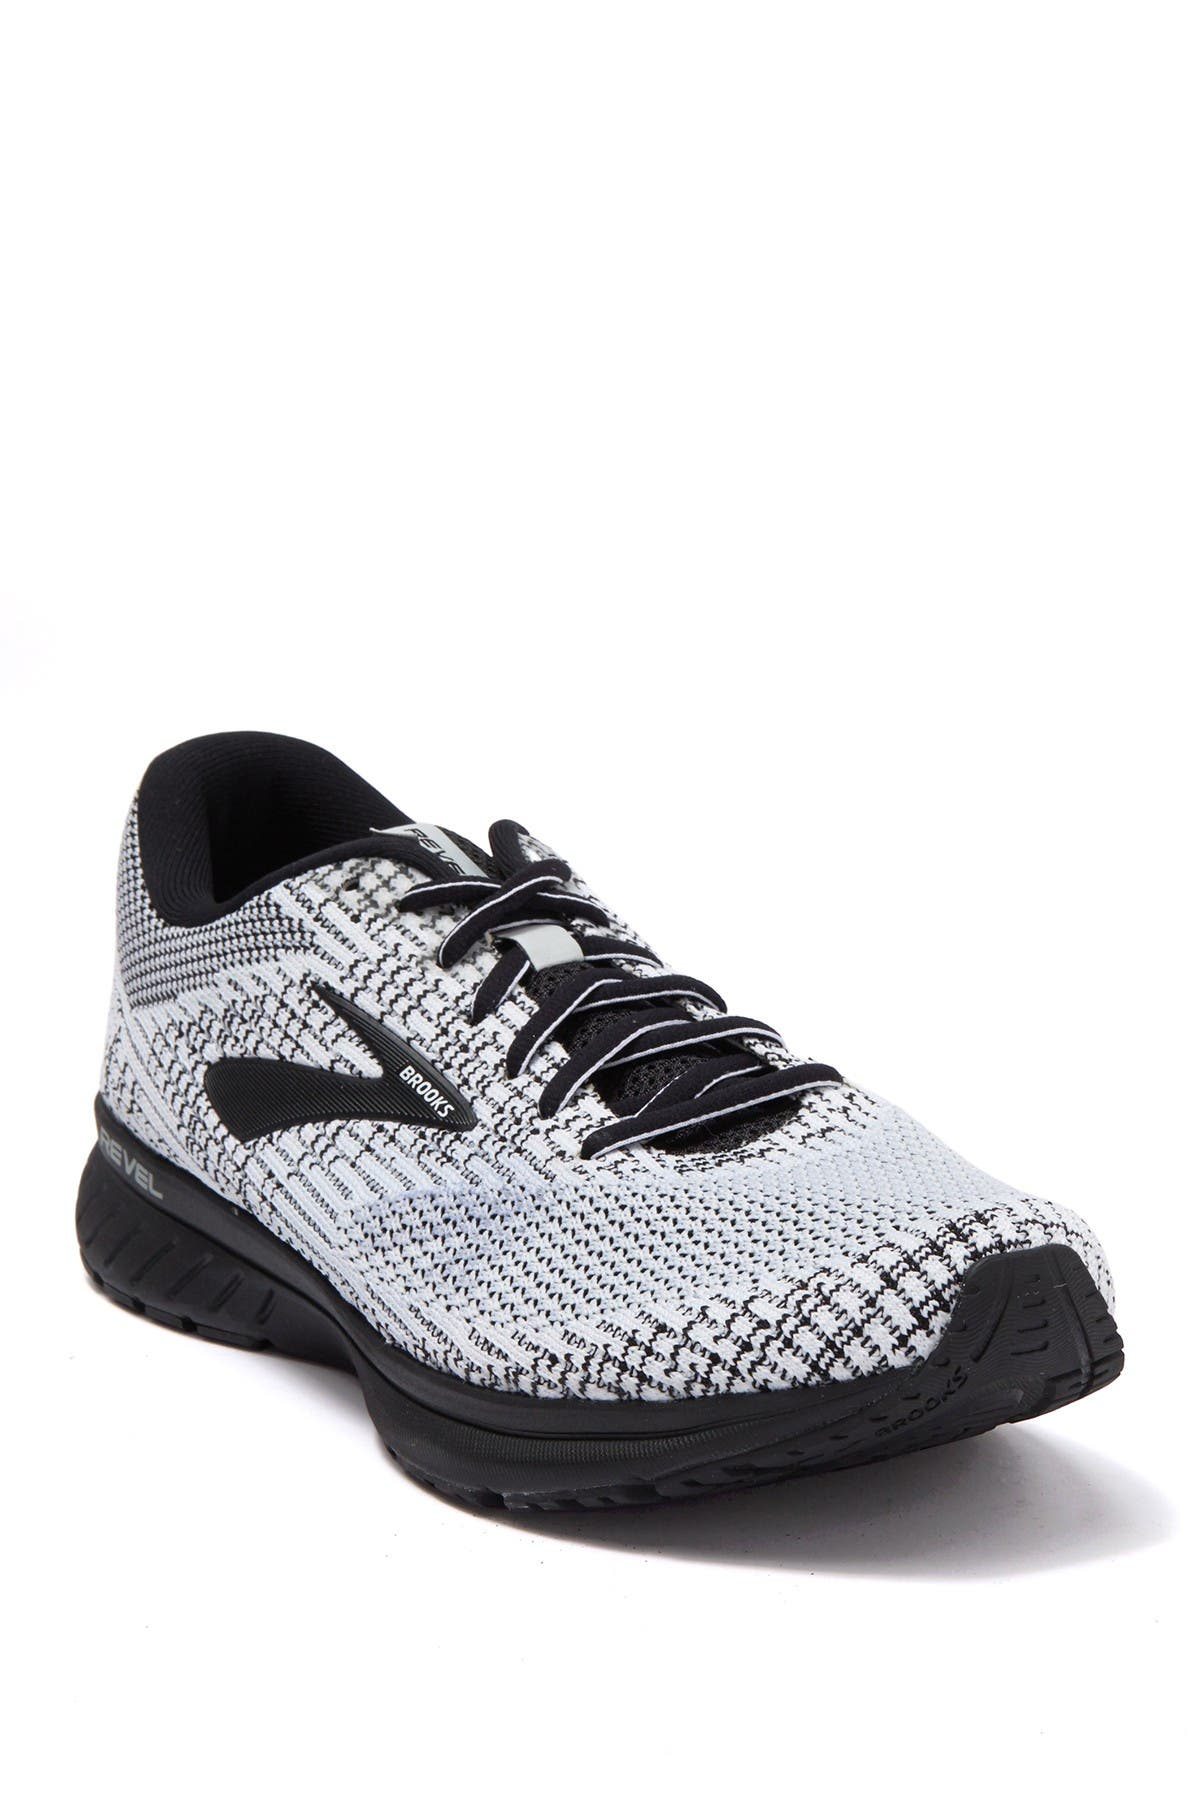 Brooks | Revel 3 Running Shoe